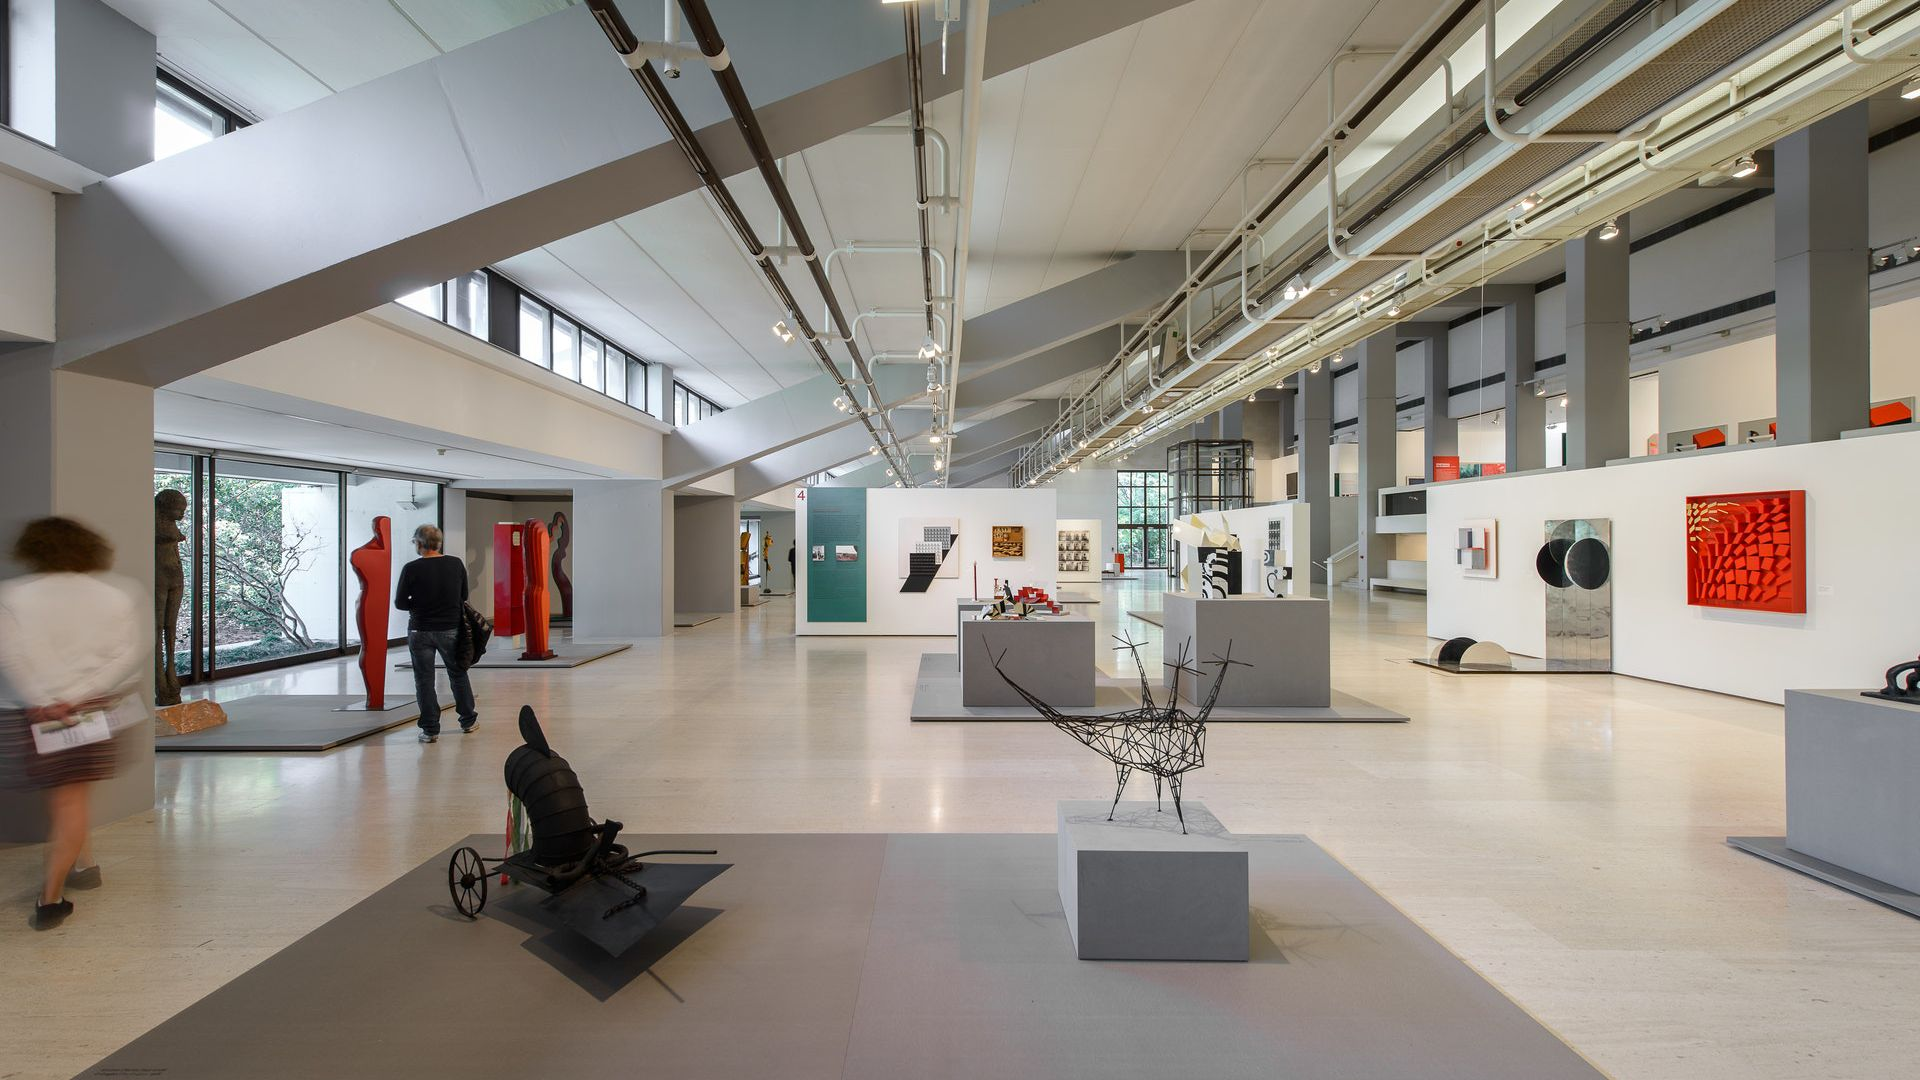 Calouste Gulbenkian Museum: Skip The Line